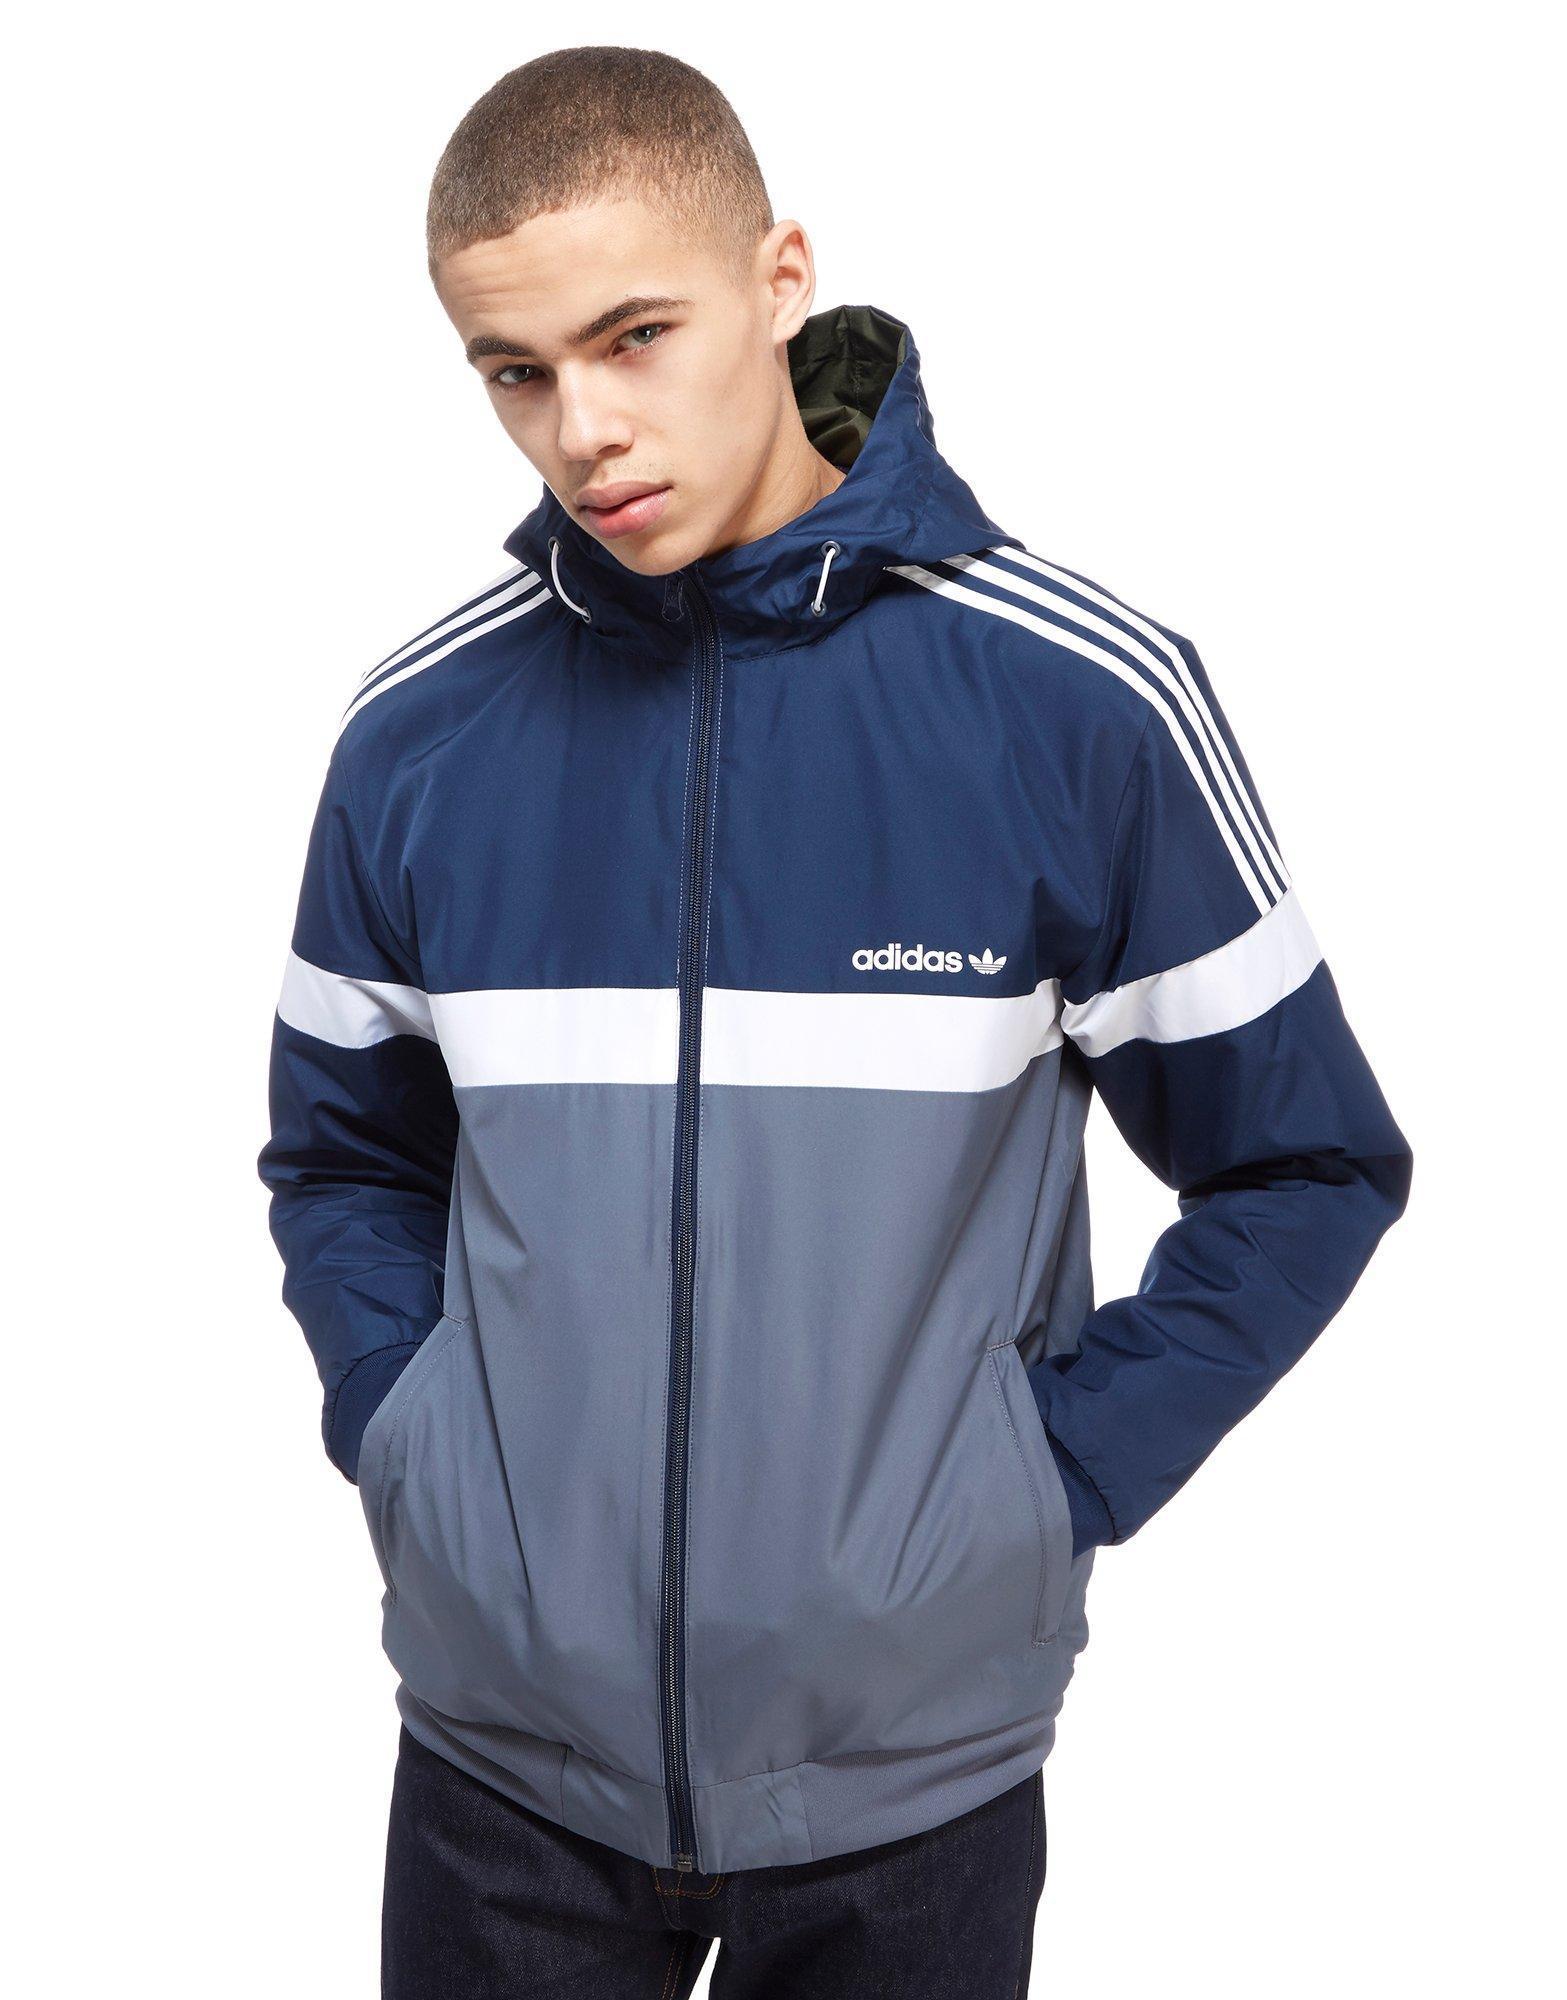 Adidas Originals Blue Itasca Reversible Jacket for men